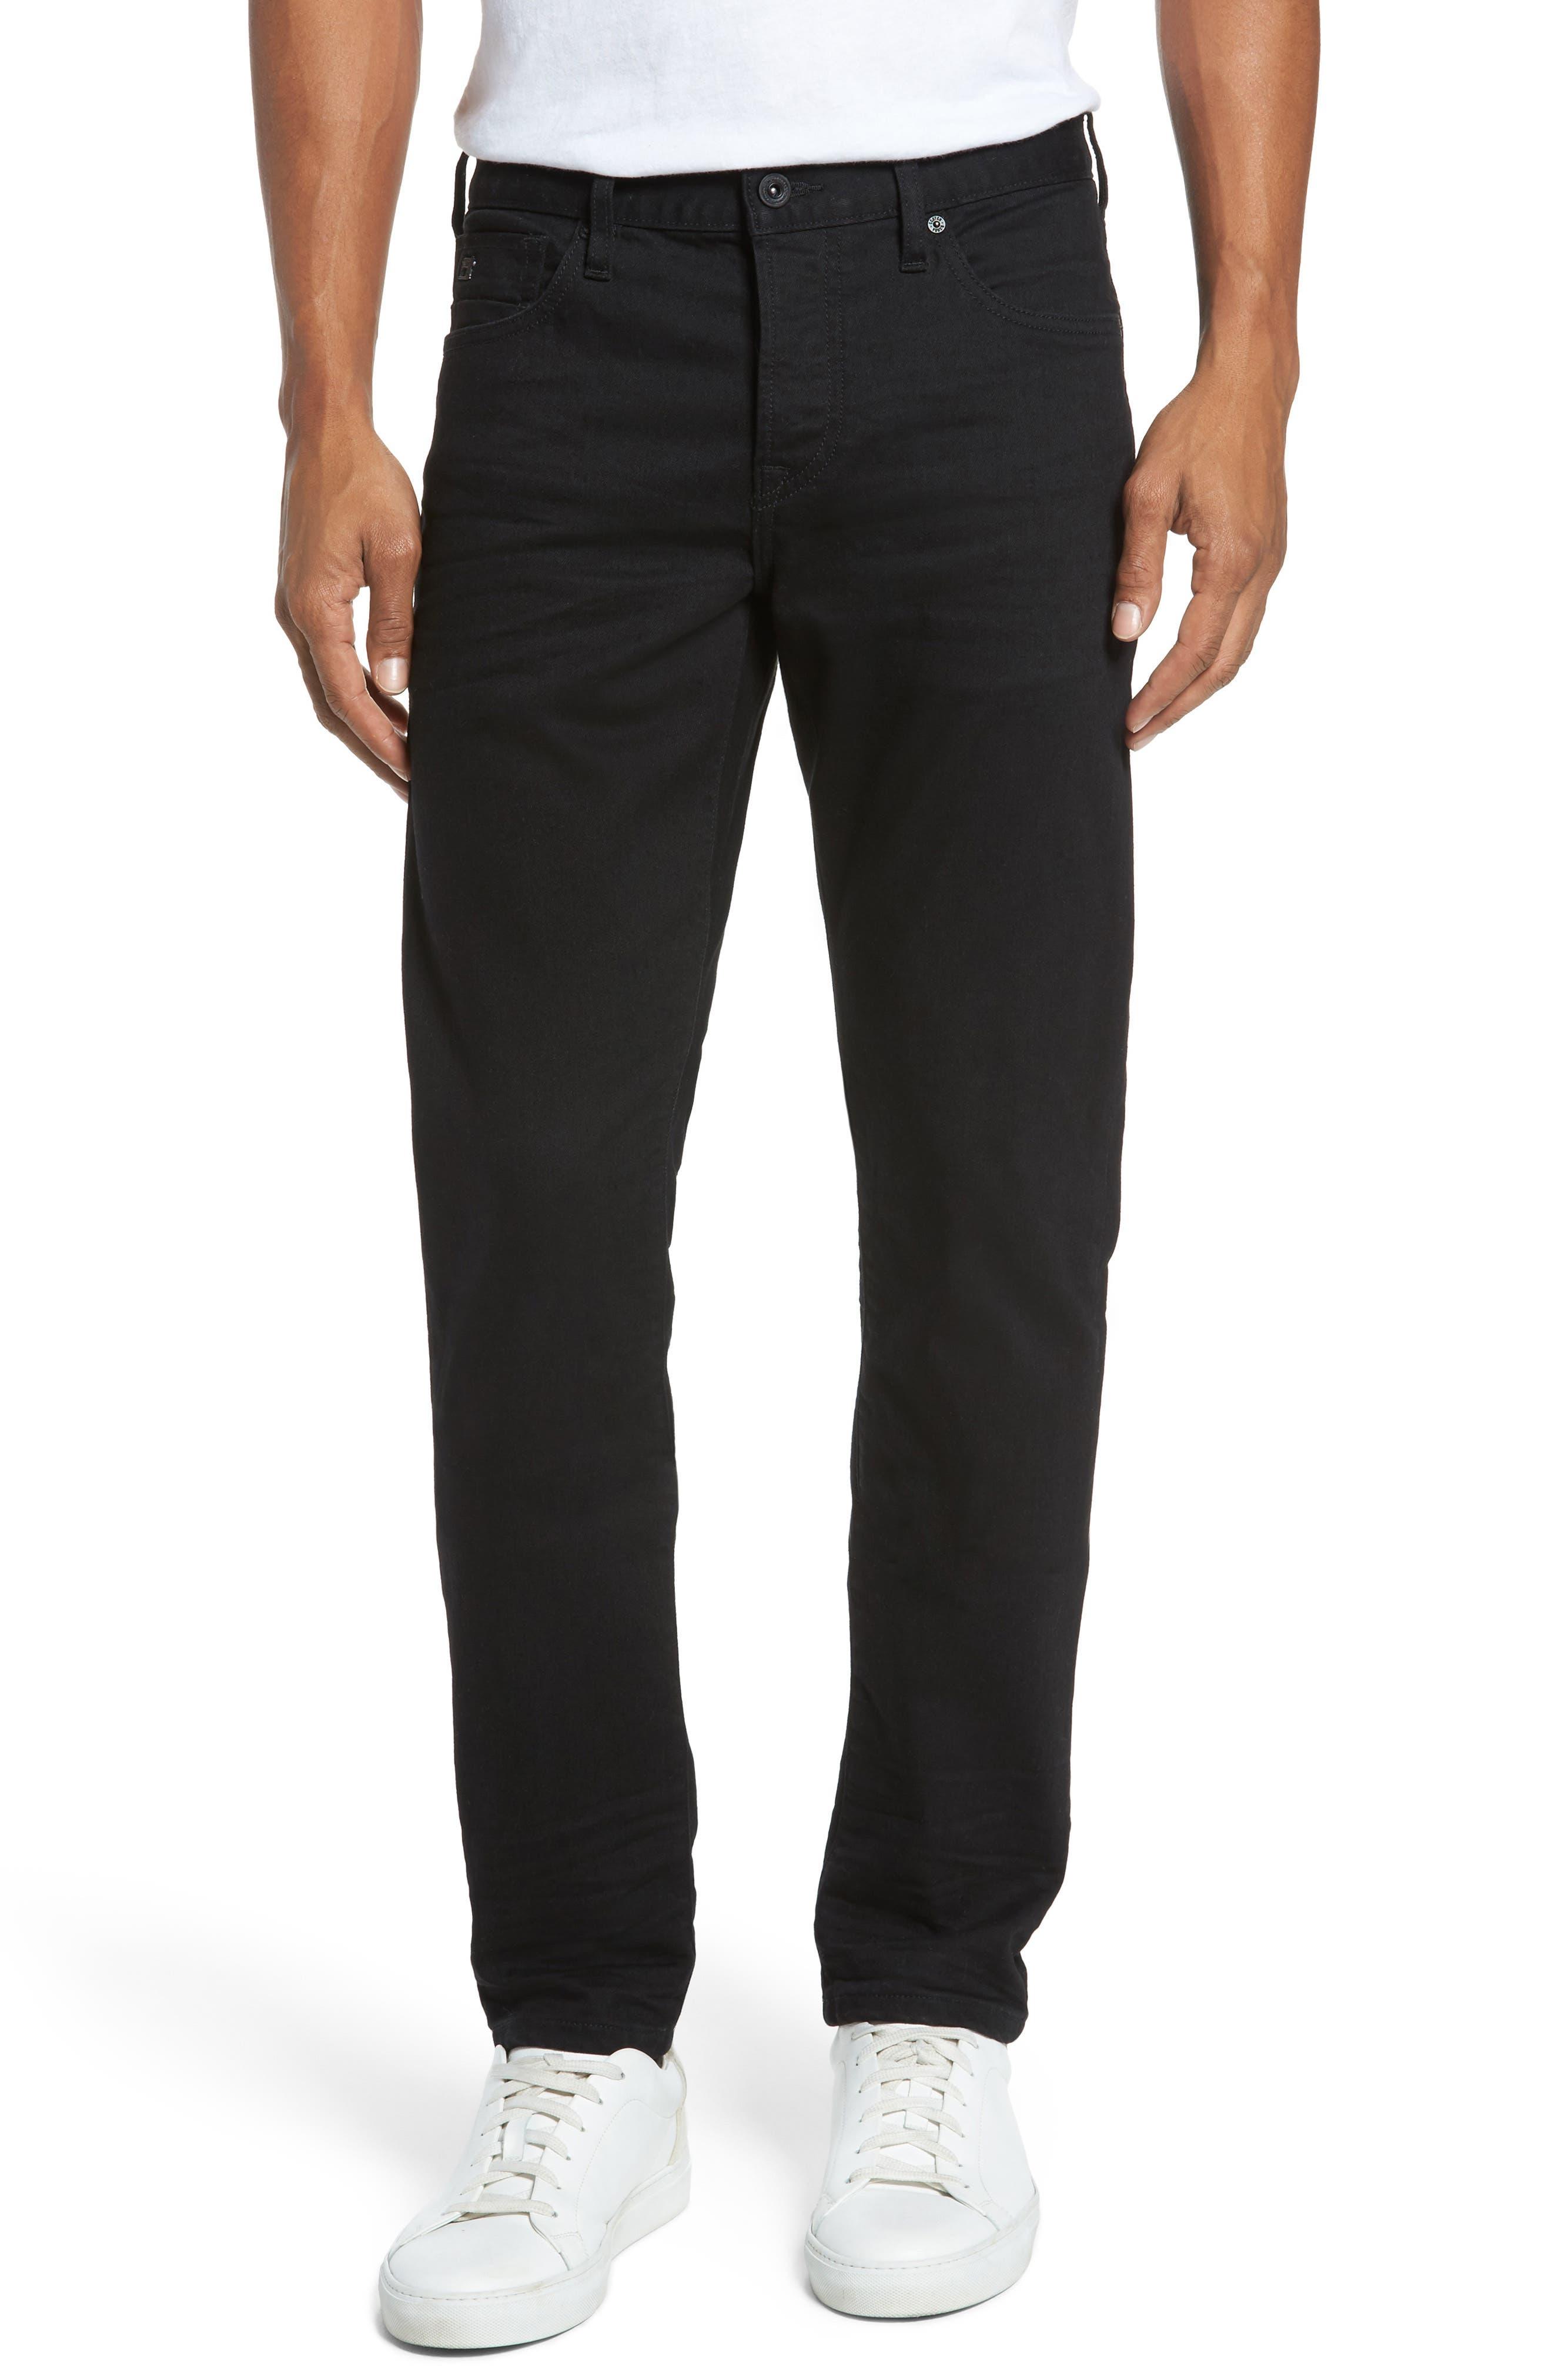 Main Image - Scotch & Soda Ralston Slim Straight Leg Jeans (Stay Black)